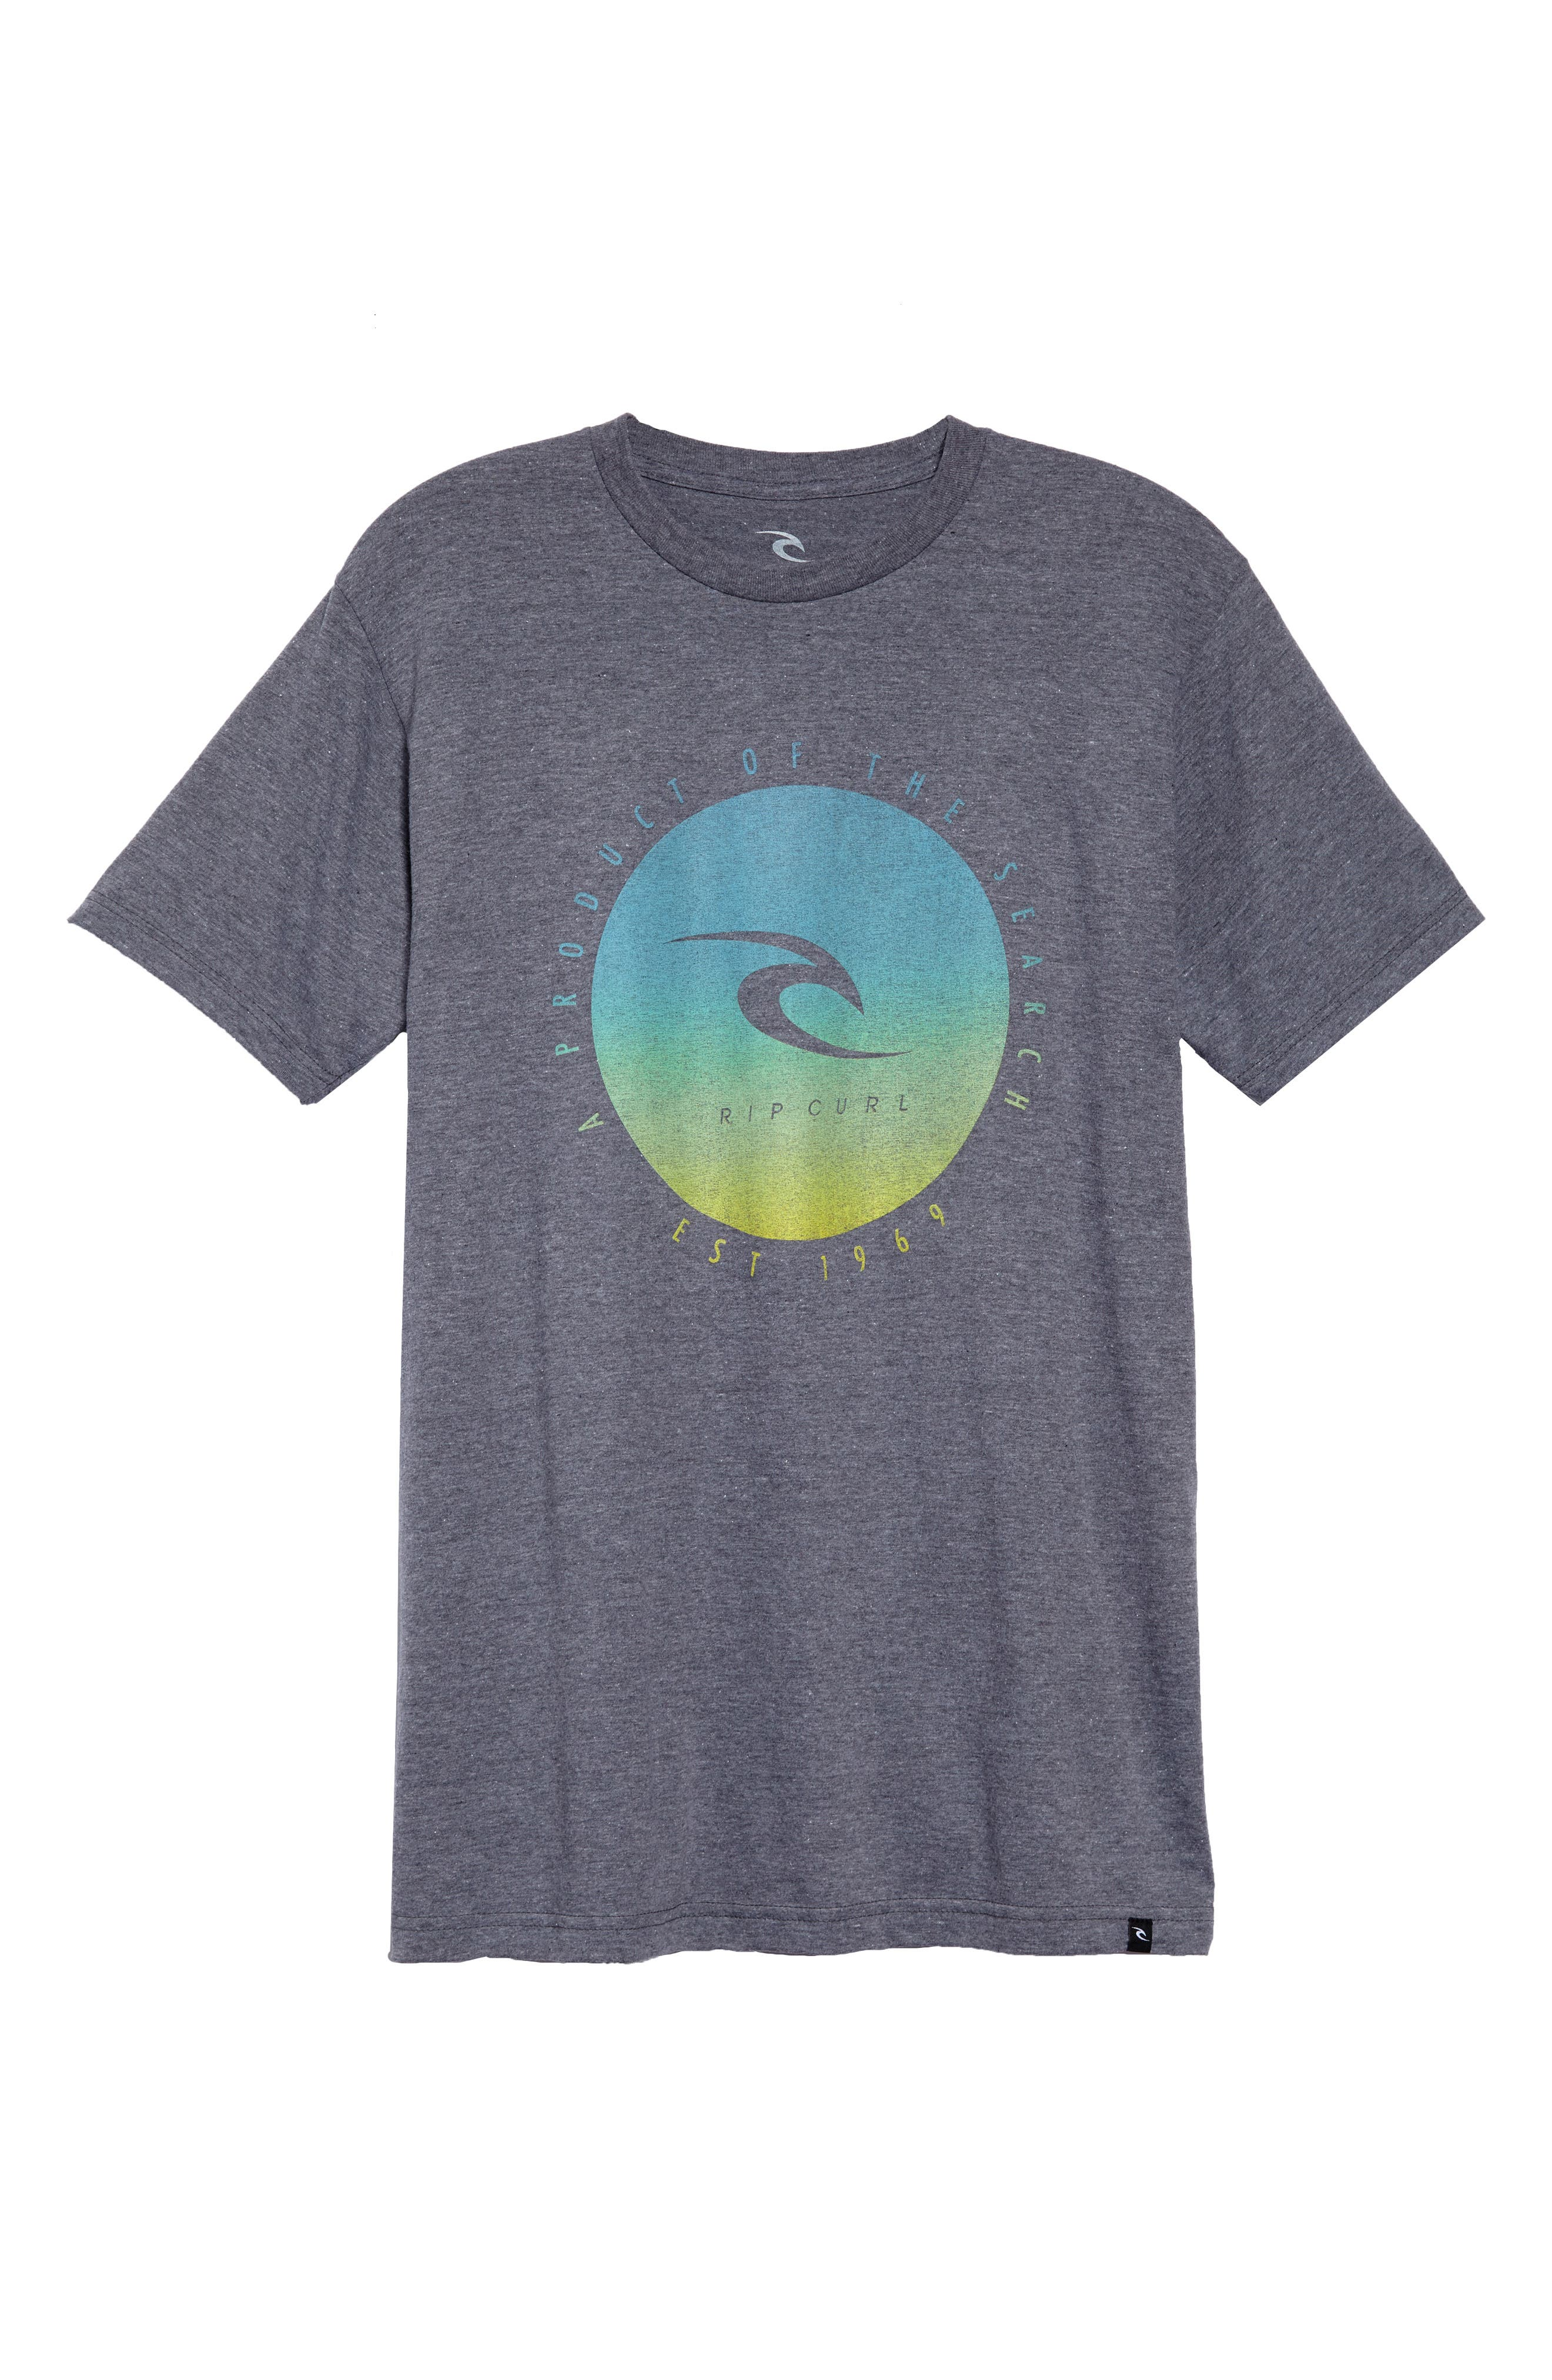 Cloud Break T-Shirt,                             Alternate thumbnail 6, color,                             080